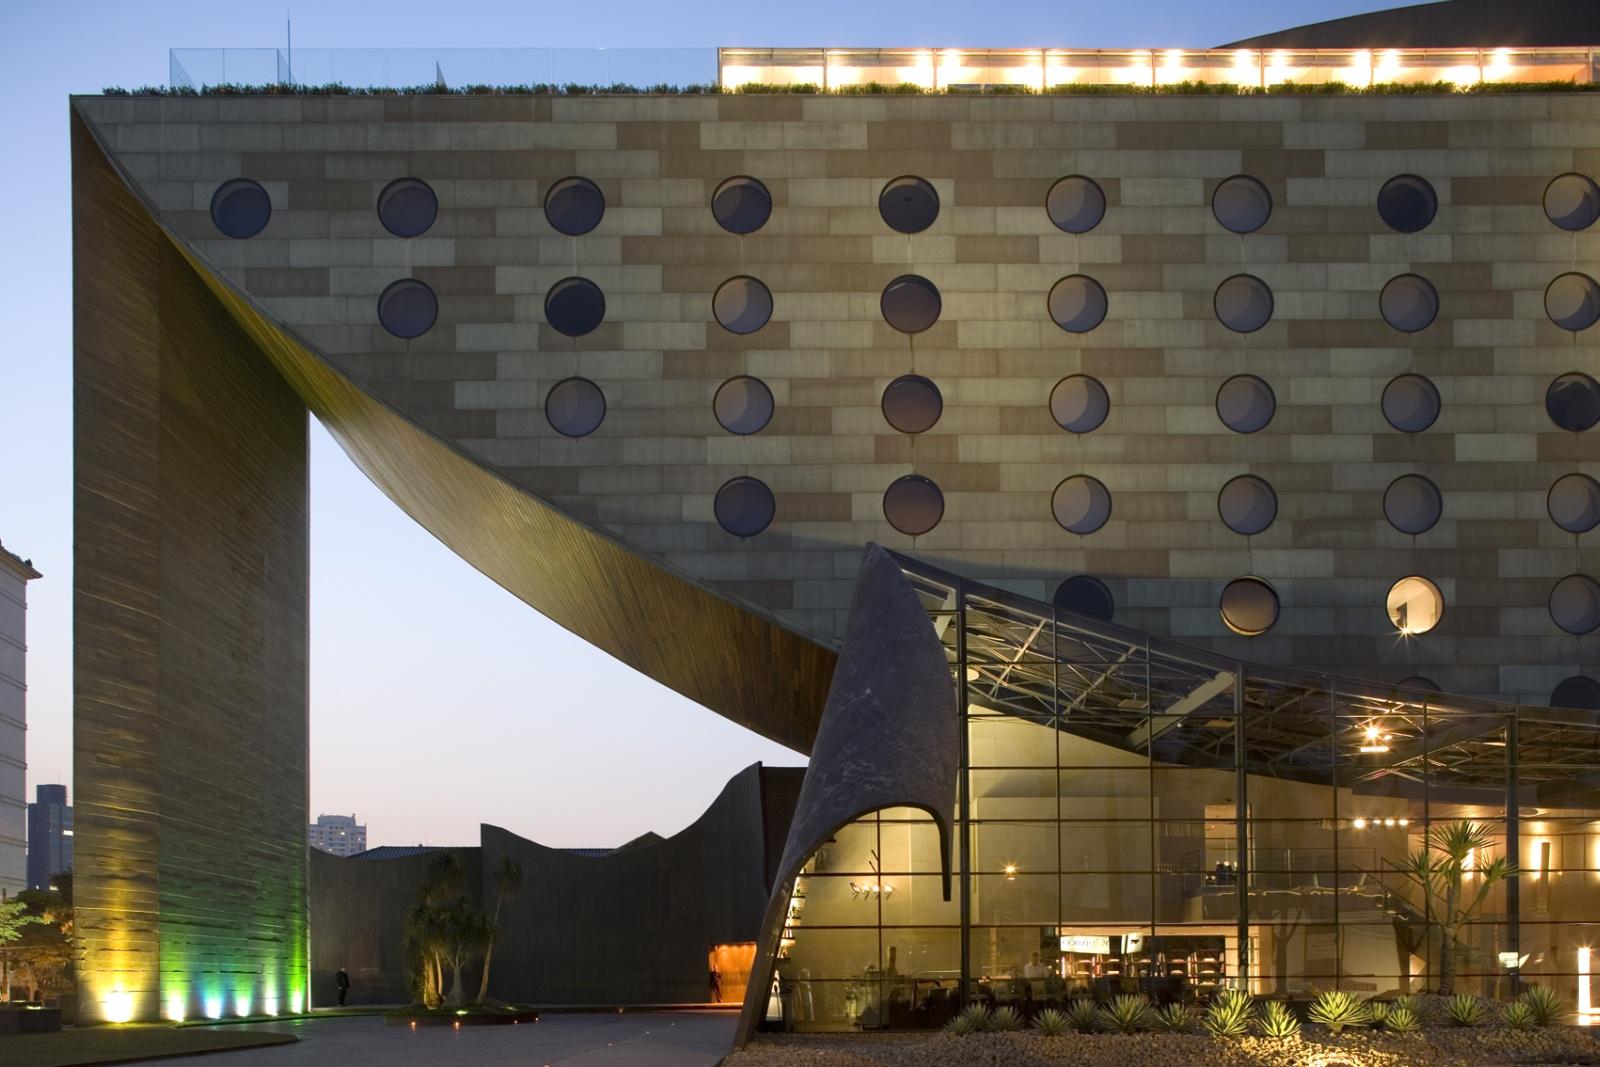 Hotel Unique Sao Paolo Go To Cool School From The Future